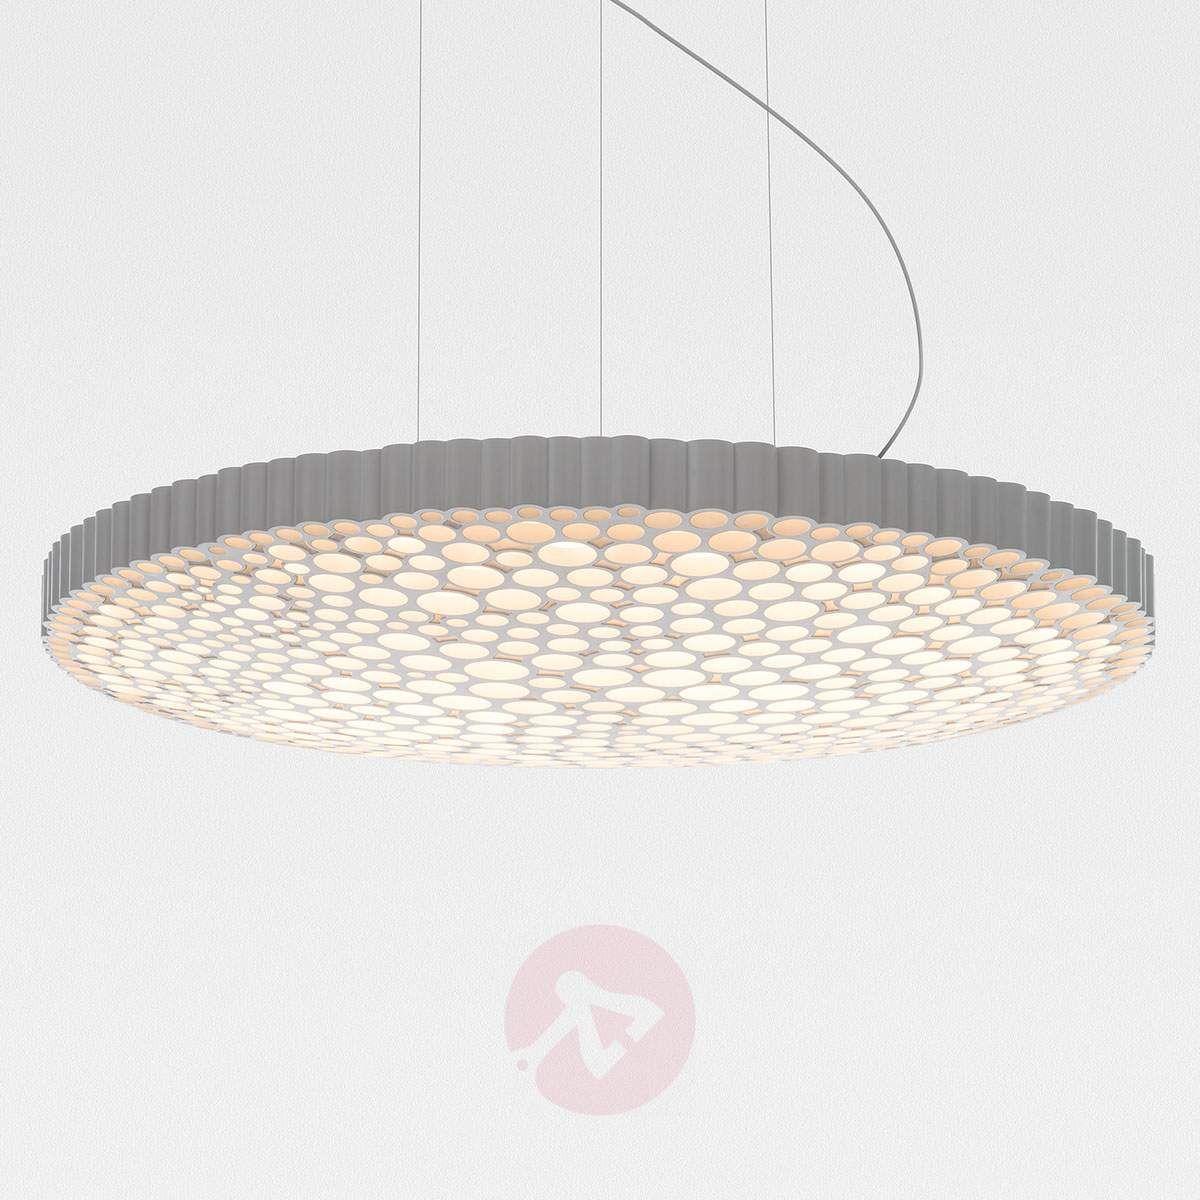 Artemide Calipso Lampa Wisząca Led 3 000 K Lampy Wiszące W